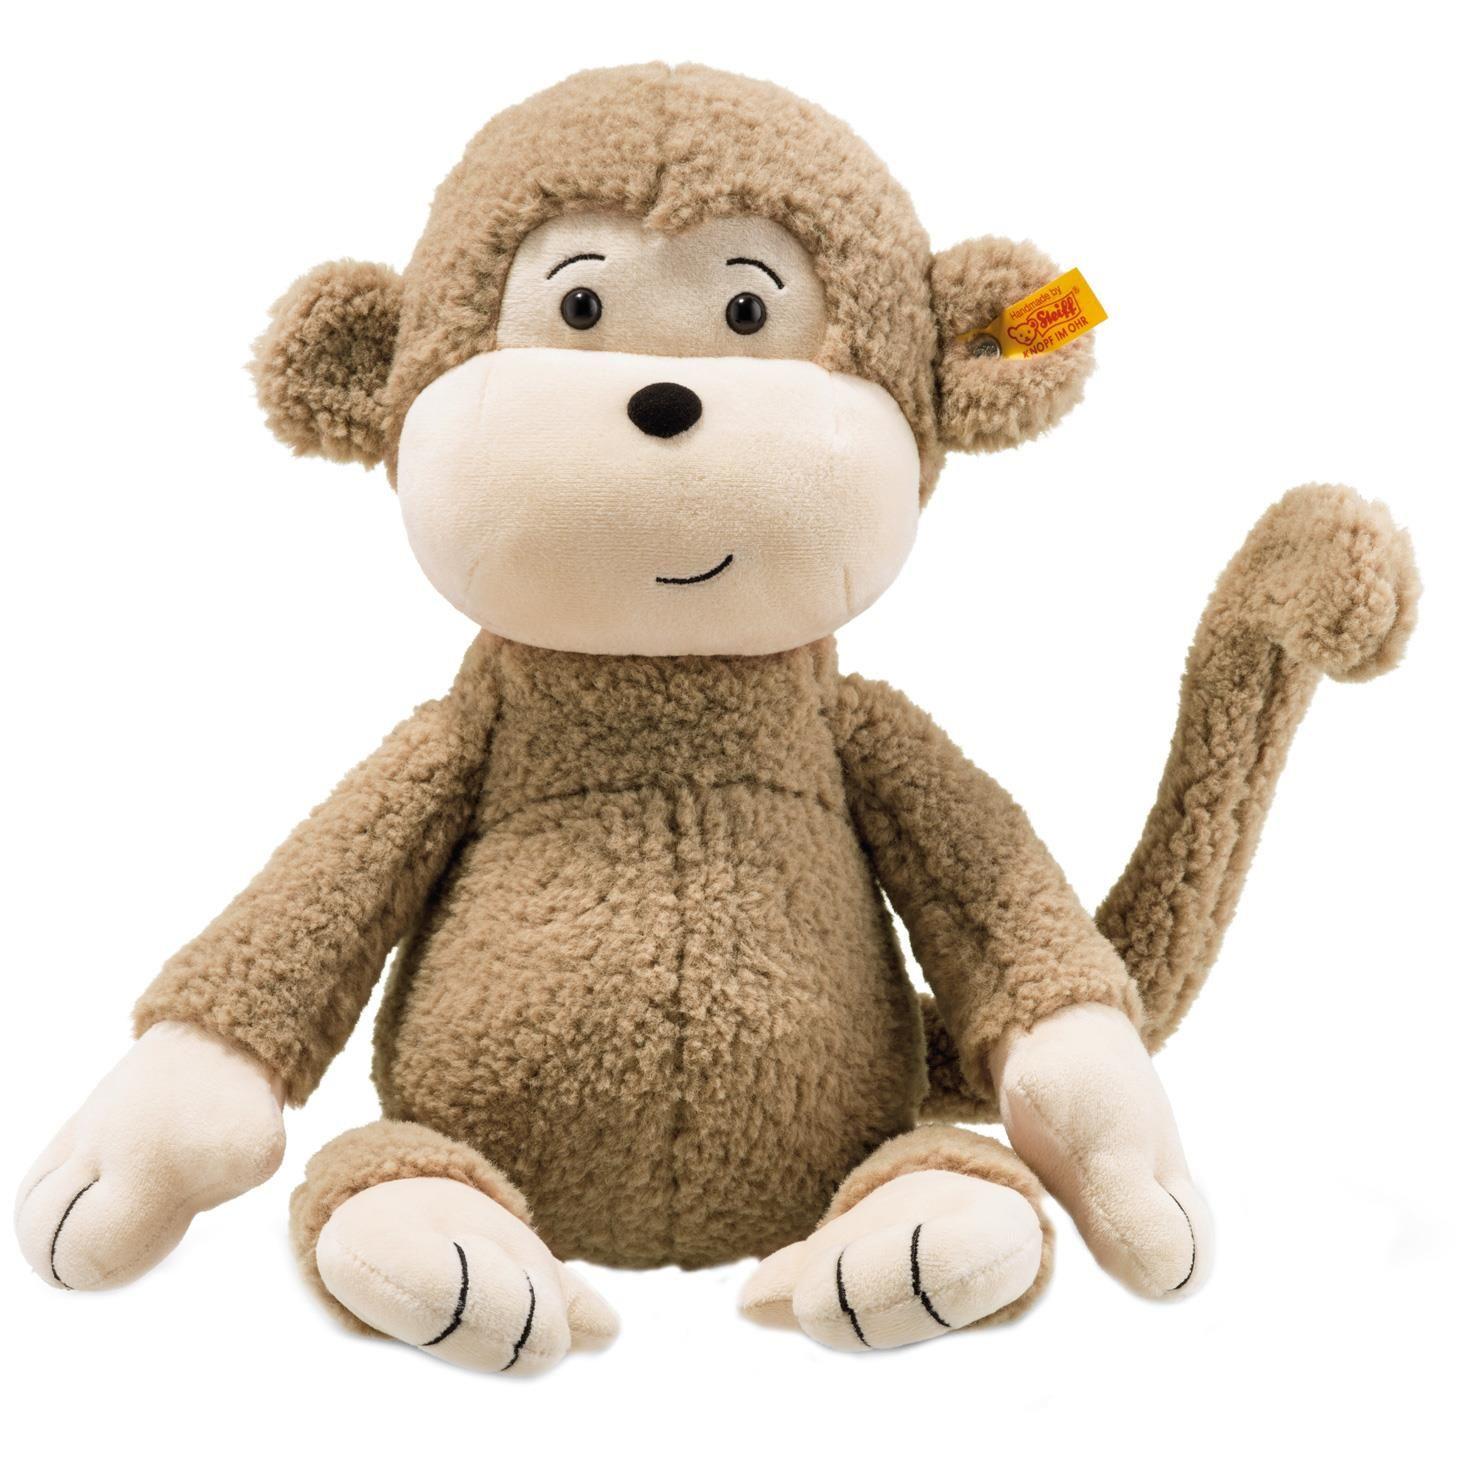 Steiff Large Brownie Monkey Stuffed Animal, 16